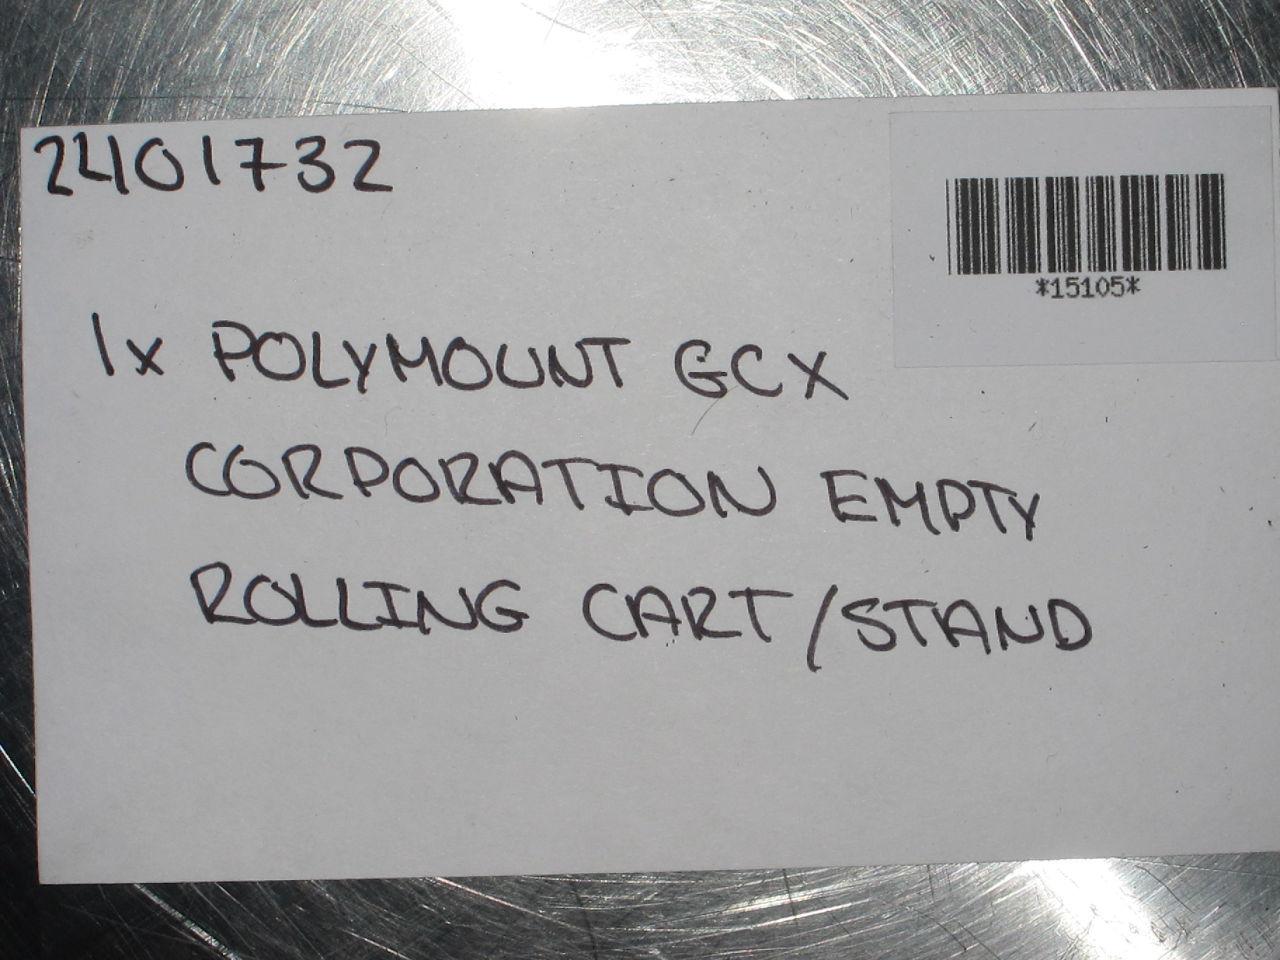 GCX Polymount